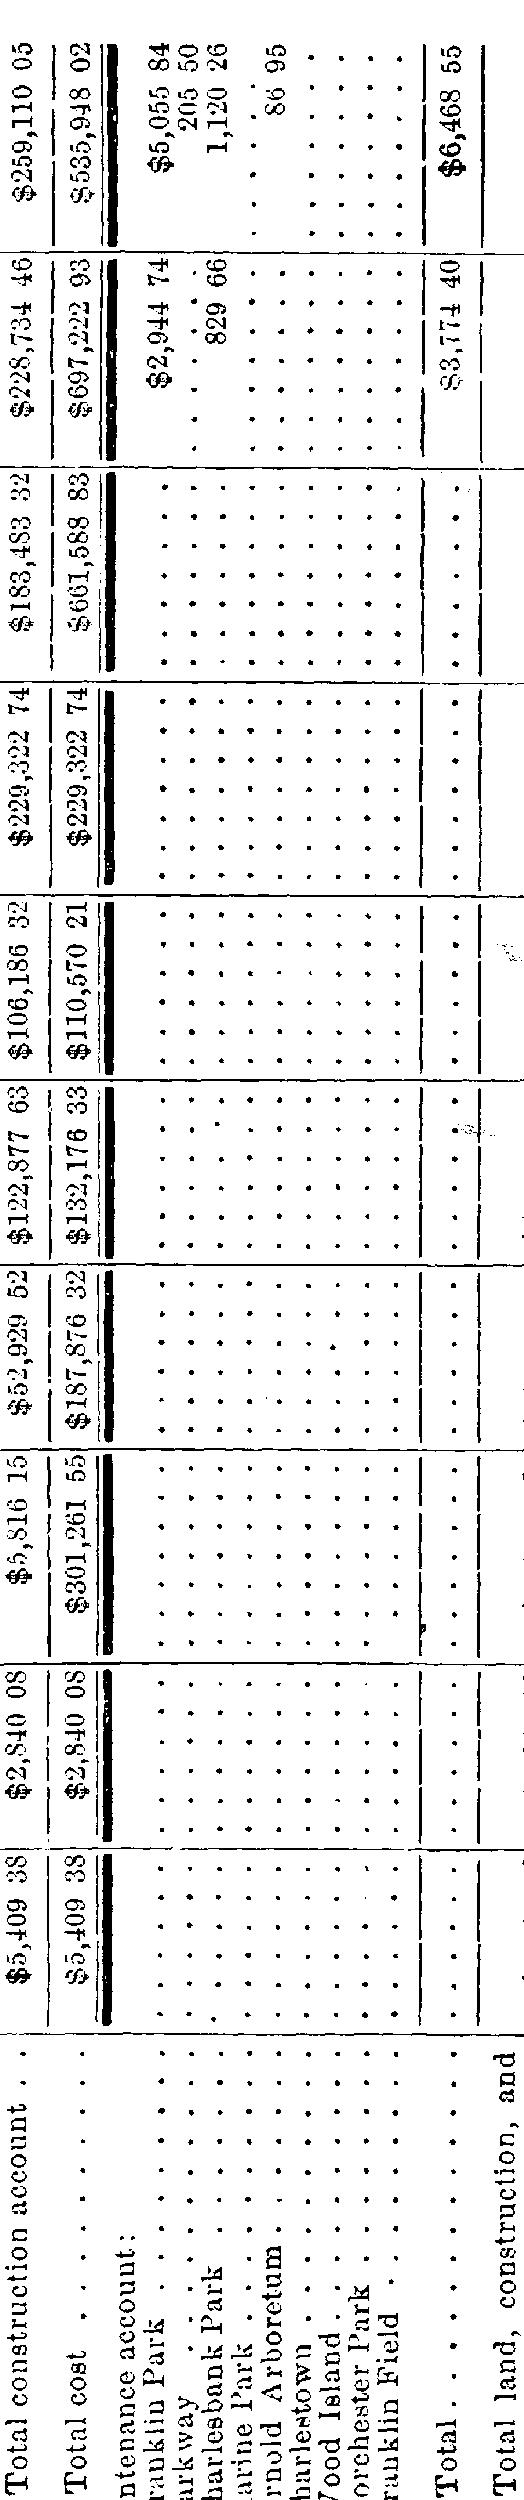 [merged small][merged small][merged small][subsumed][merged small][merged small][merged small][merged small][merged small][merged small][merged small][merged small][merged small][subsumed][merged small][merged small][merged small][ocr errors][merged small][merged small][ocr errors][ocr errors][merged small][ocr errors][merged small][merged small][merged small][ocr errors][ocr errors][subsumed][ocr errors][ocr errors][merged small][merged small][merged small]